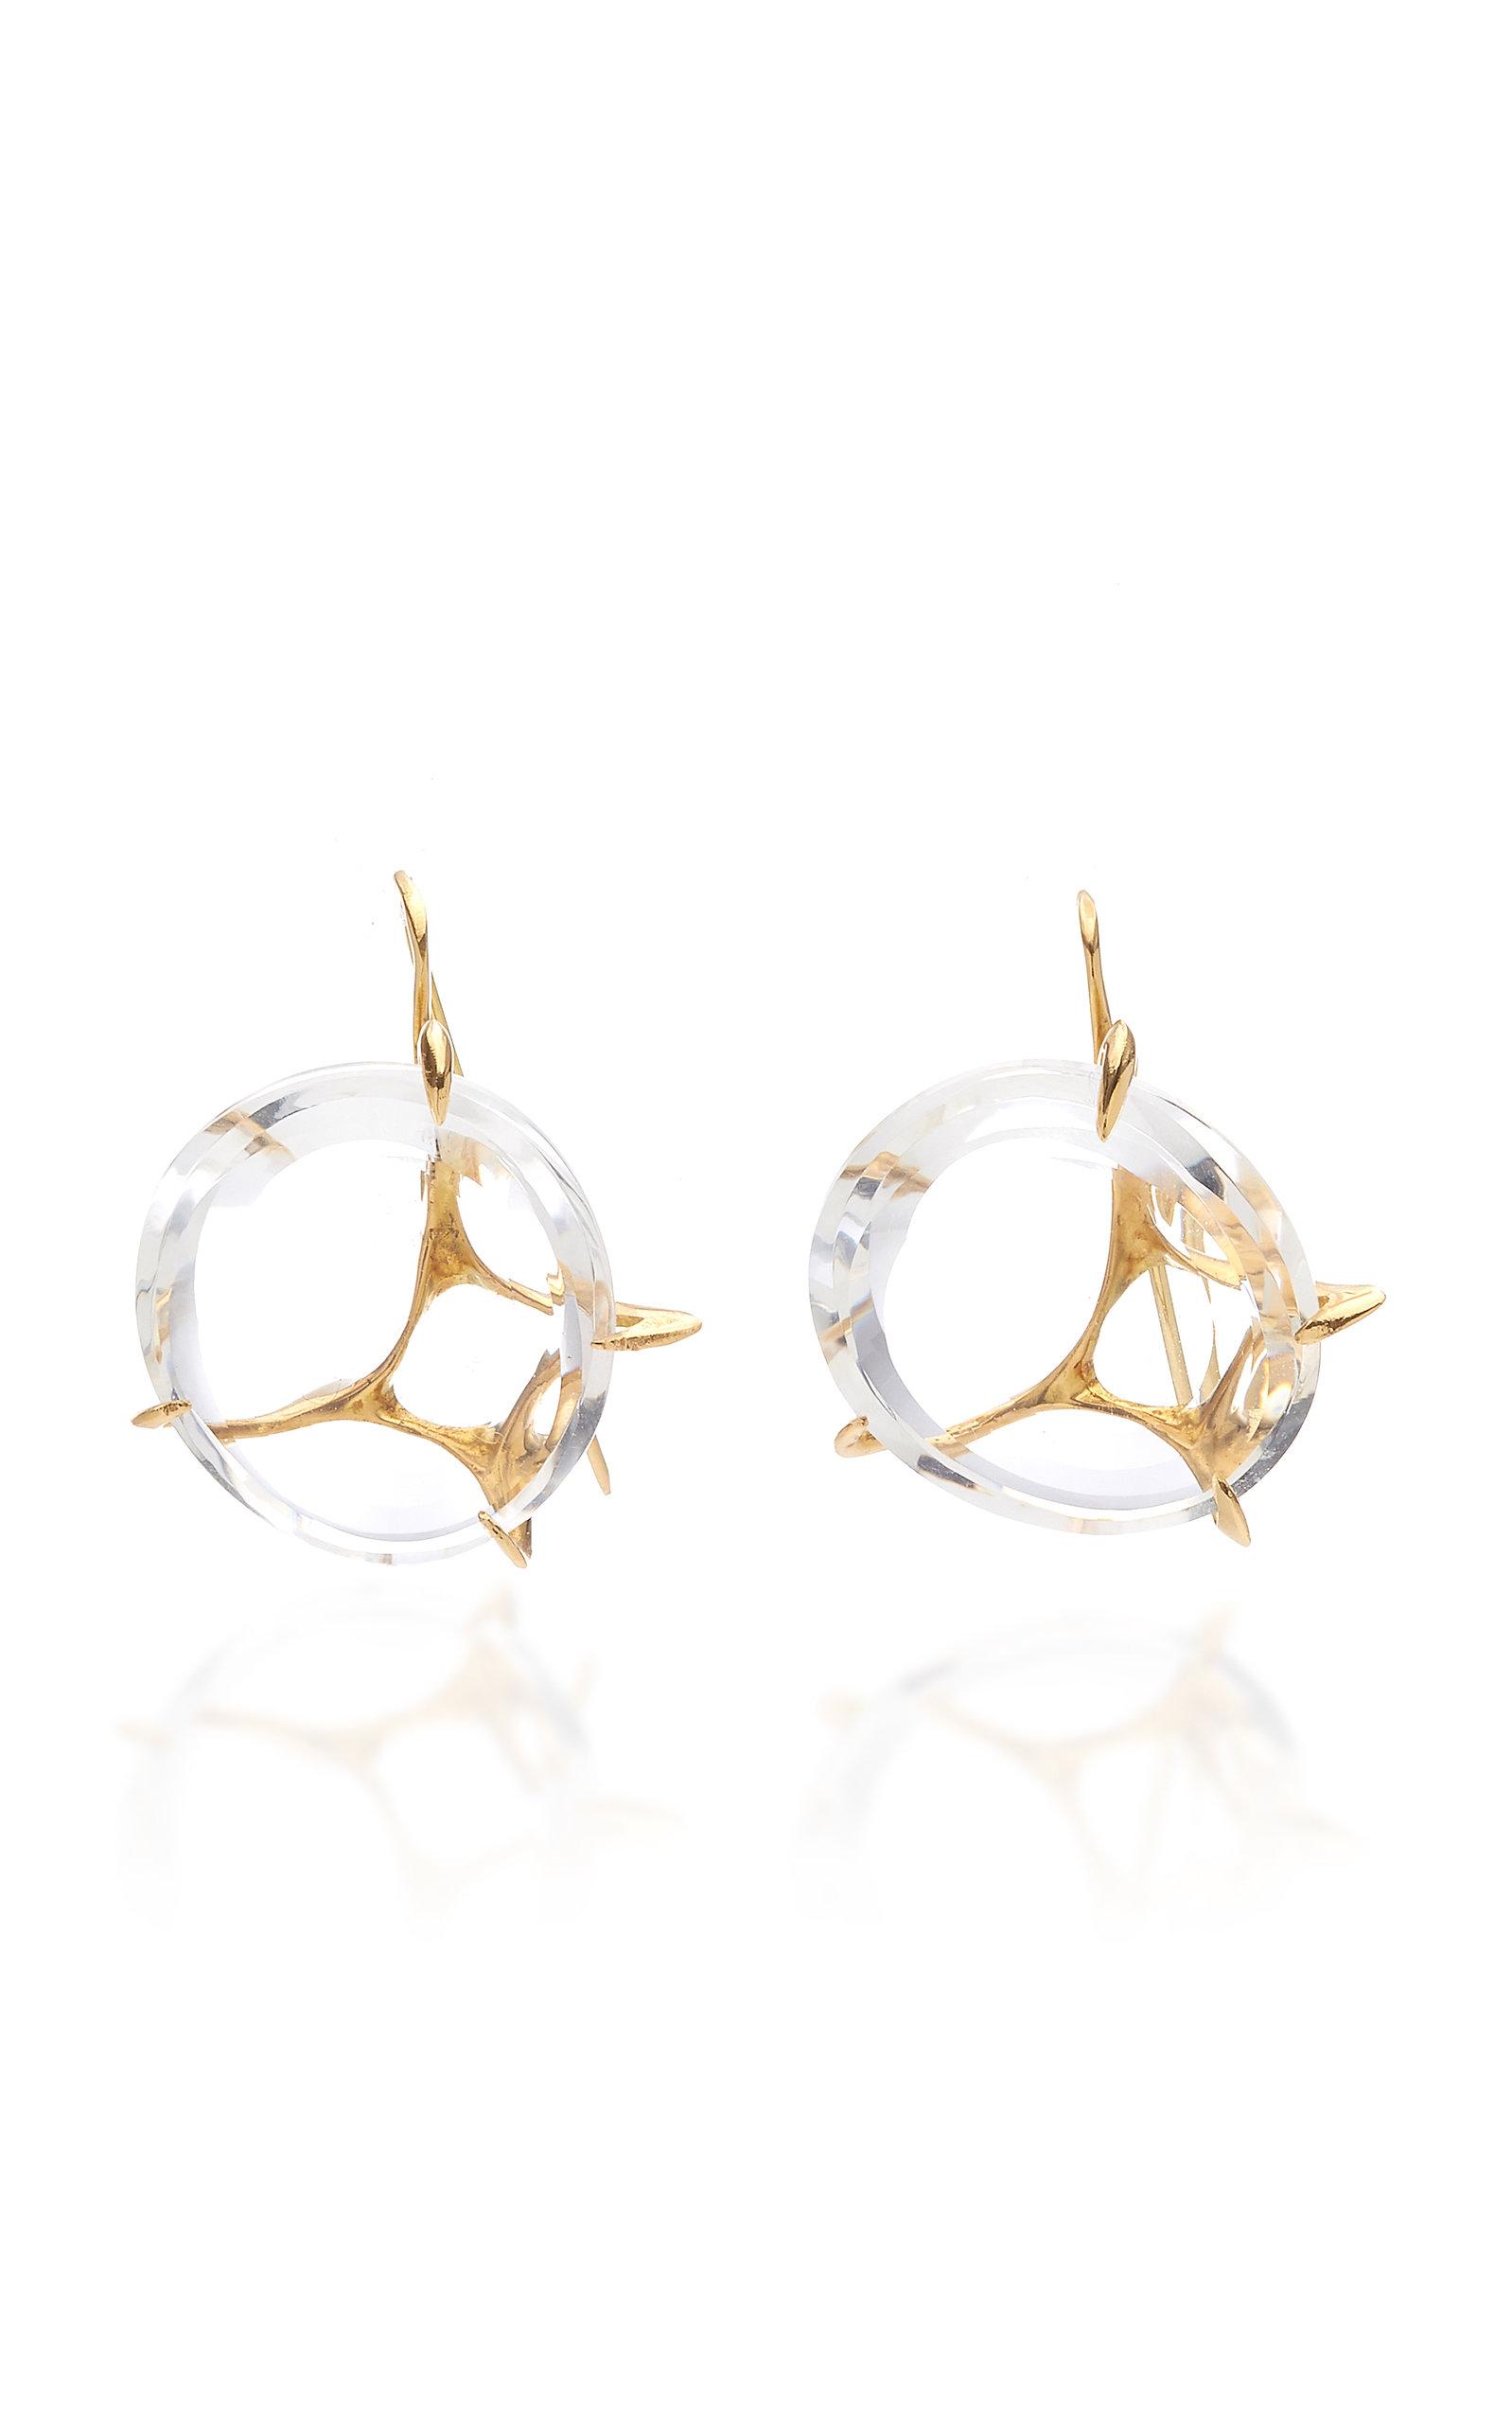 Women's Brinco Envolto Quartz 18K Gold Earrings